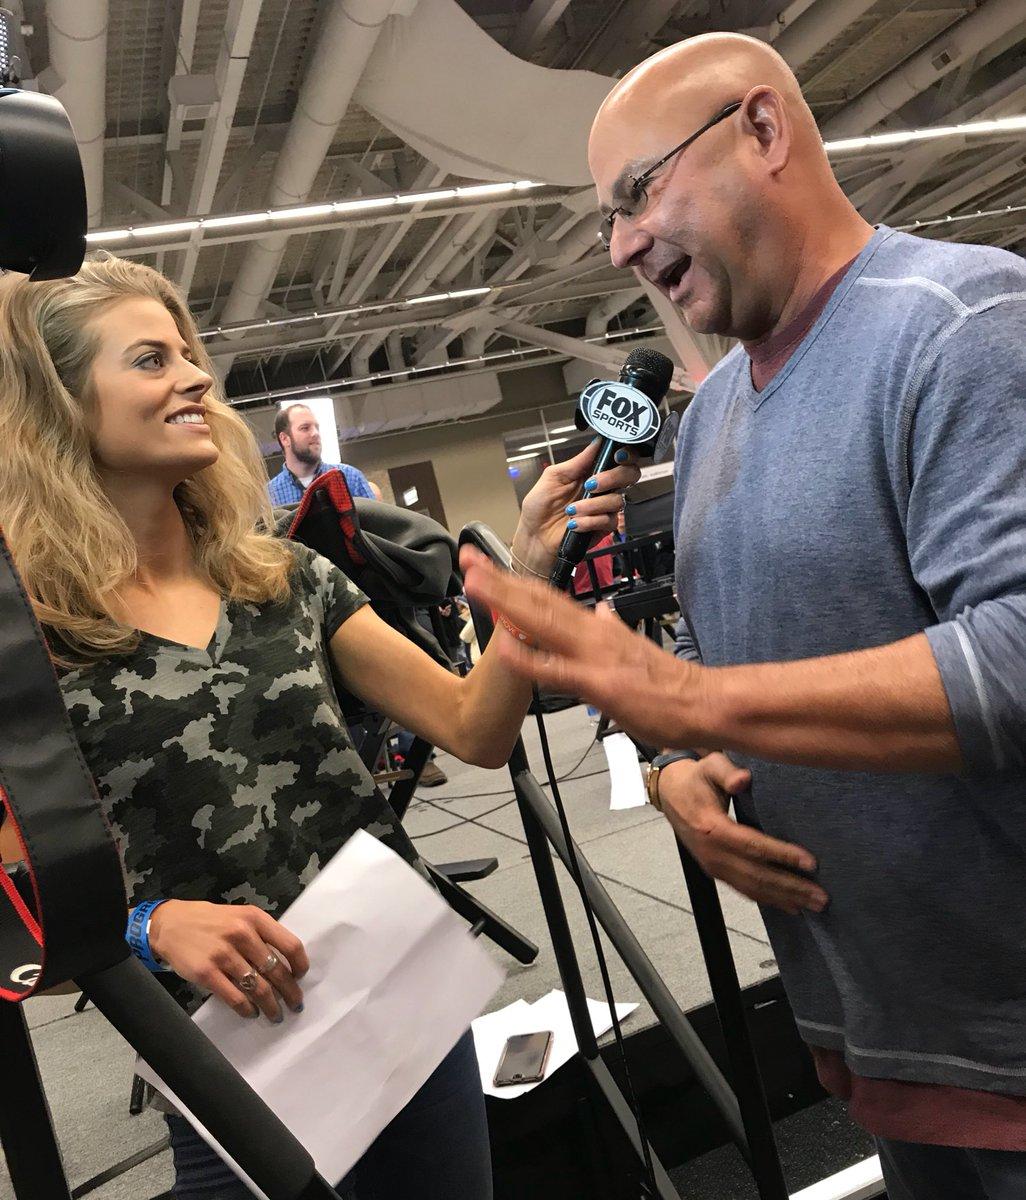 Having a dad joke war w/ Tito. #TribeFest @FOXSportsOH https://t.co/9Z8zCfEKB5